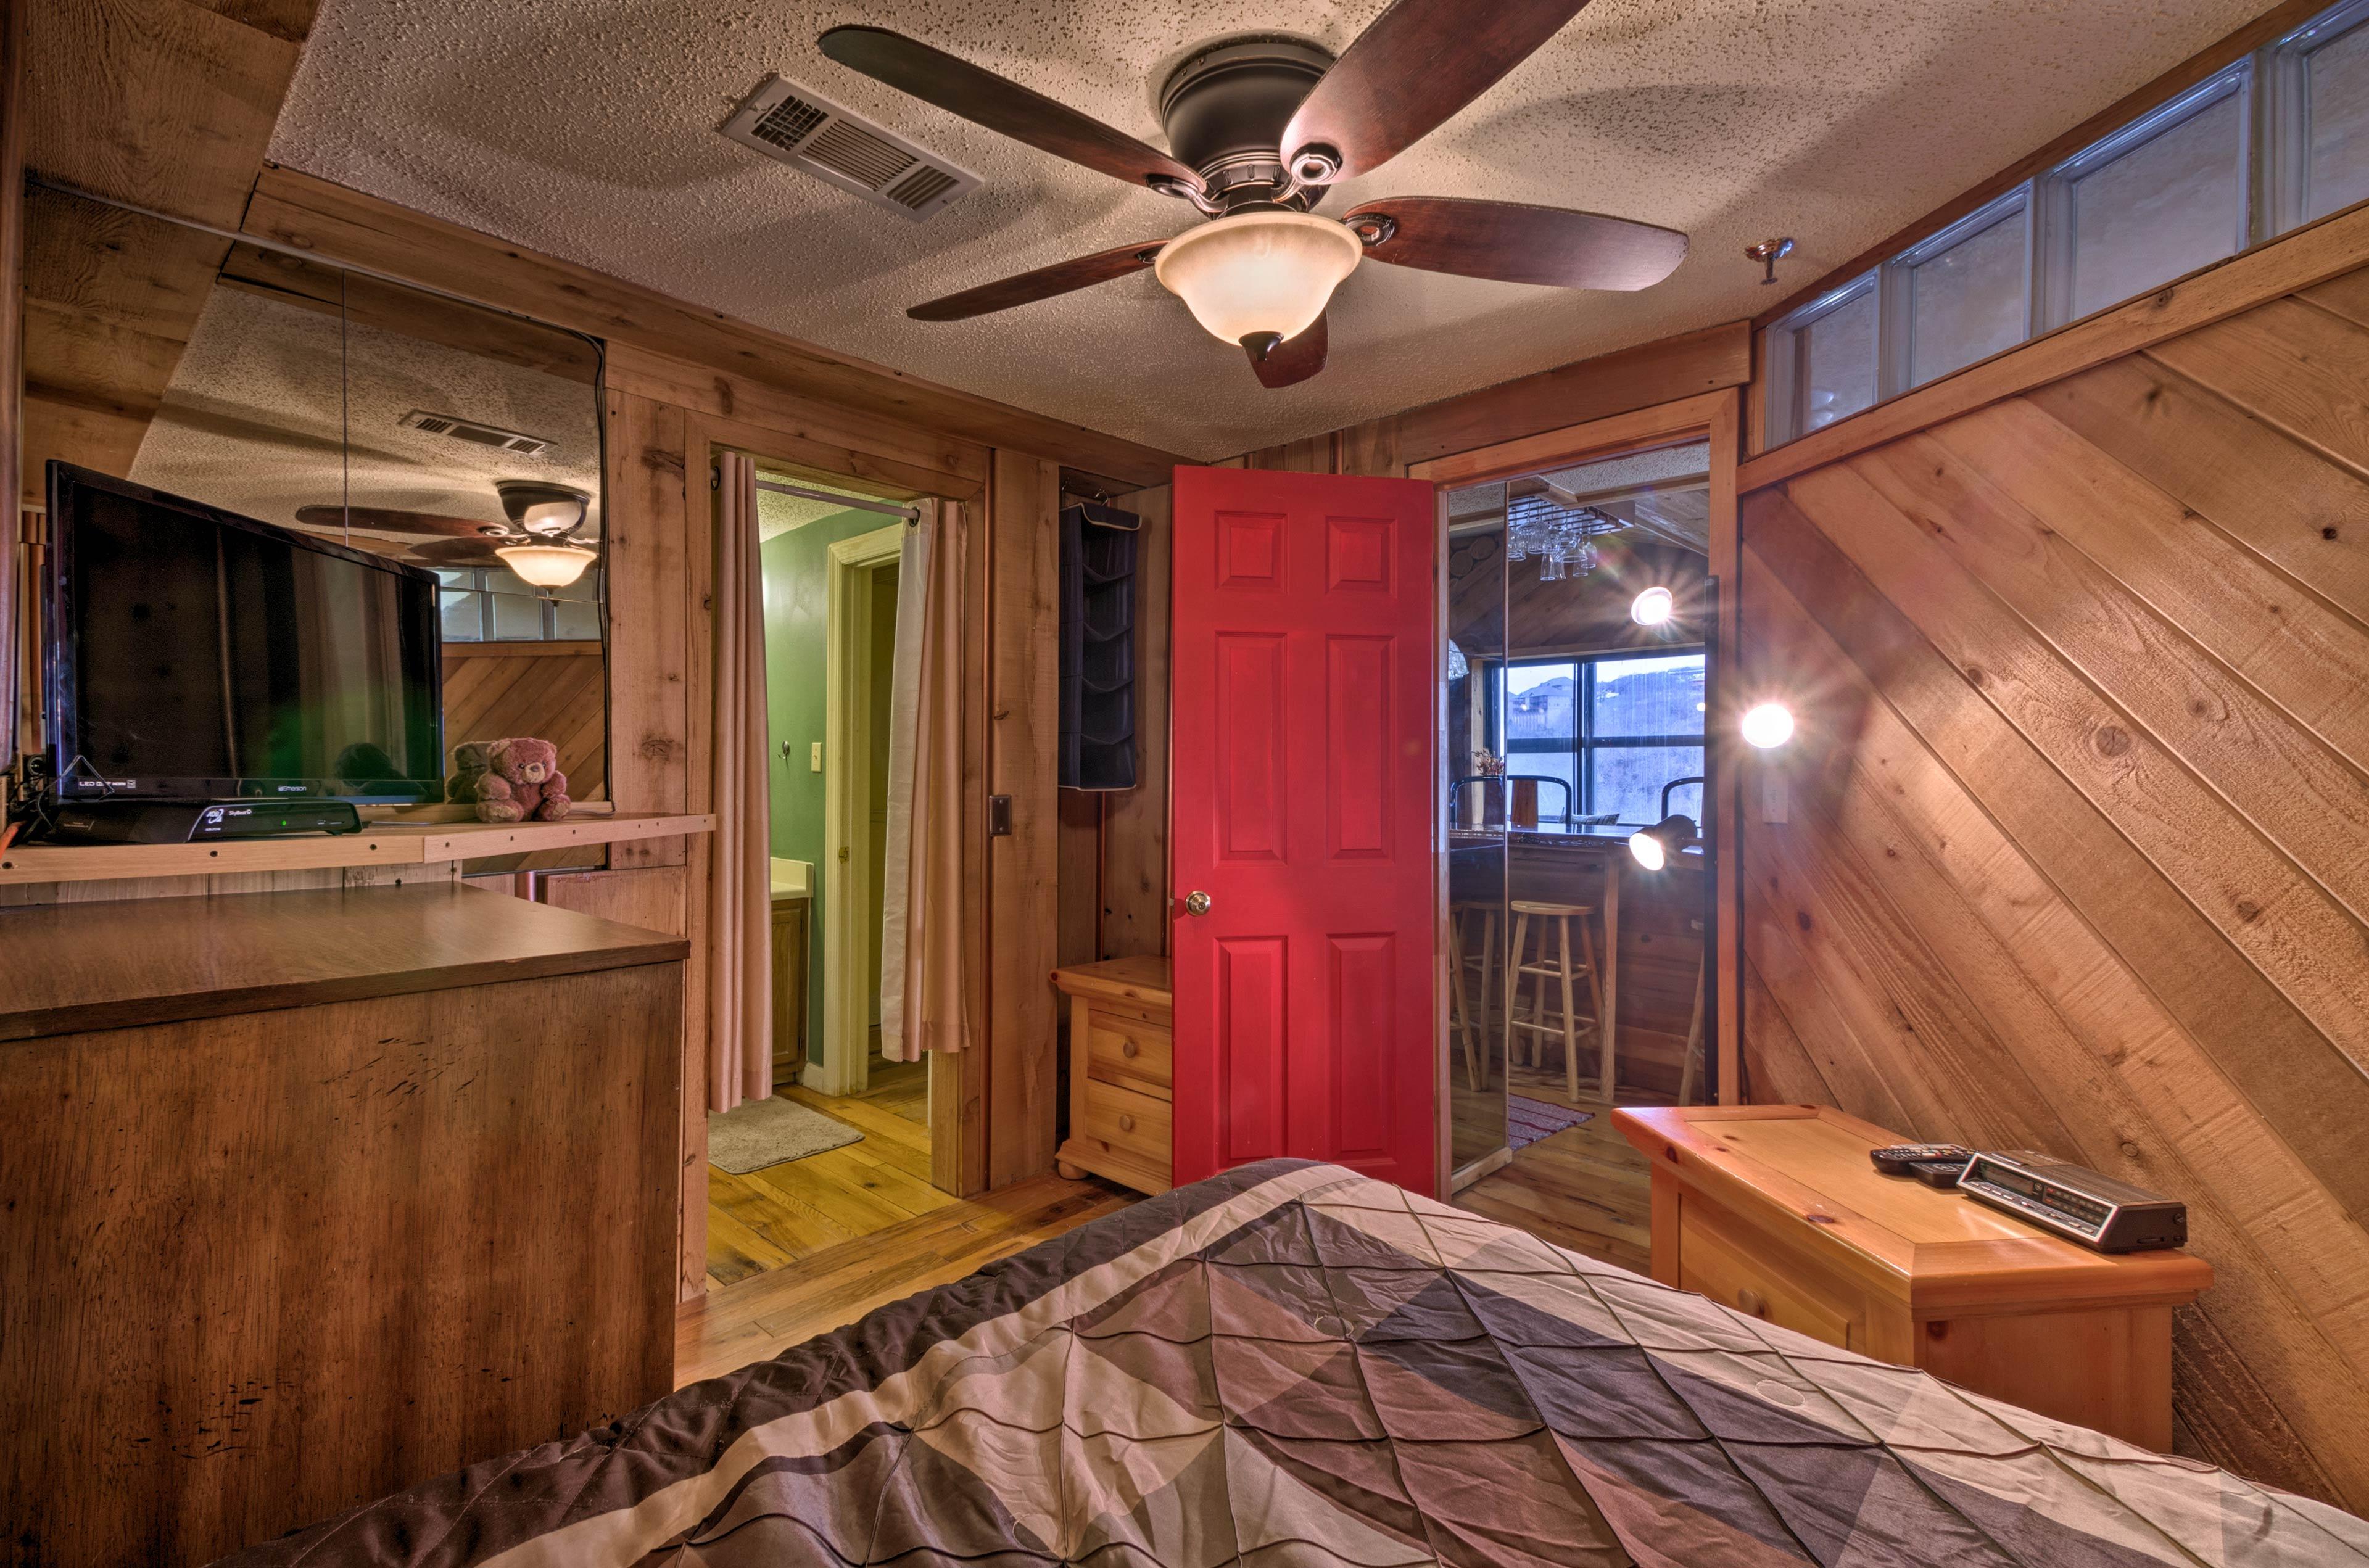 Enjoy access to a private en-suite bathroom!